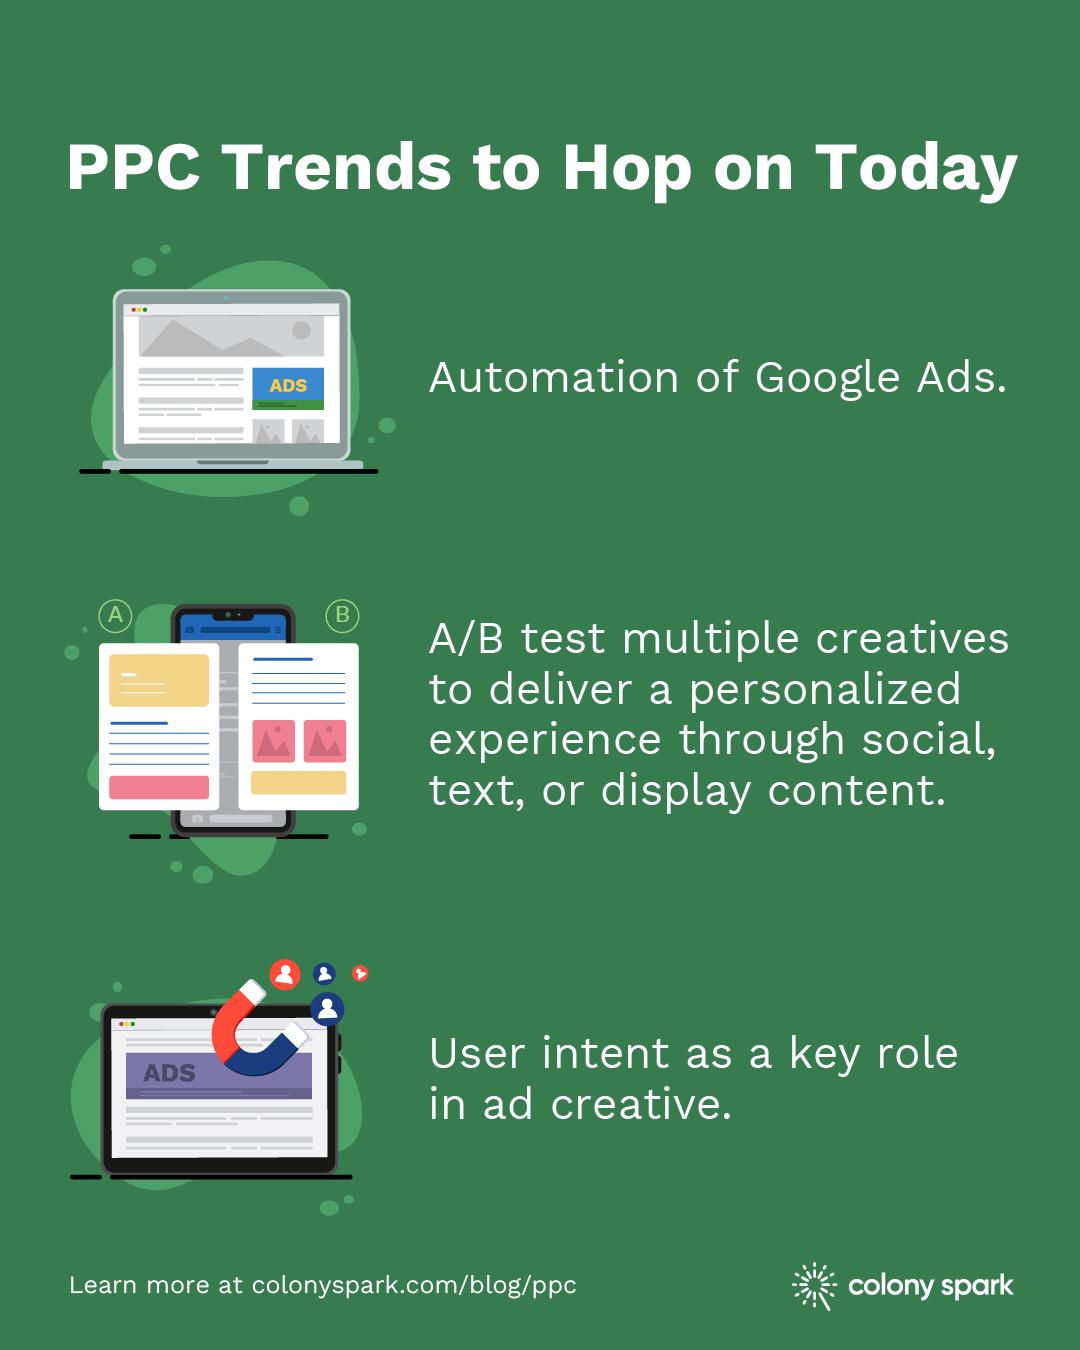 Three PPC Trends